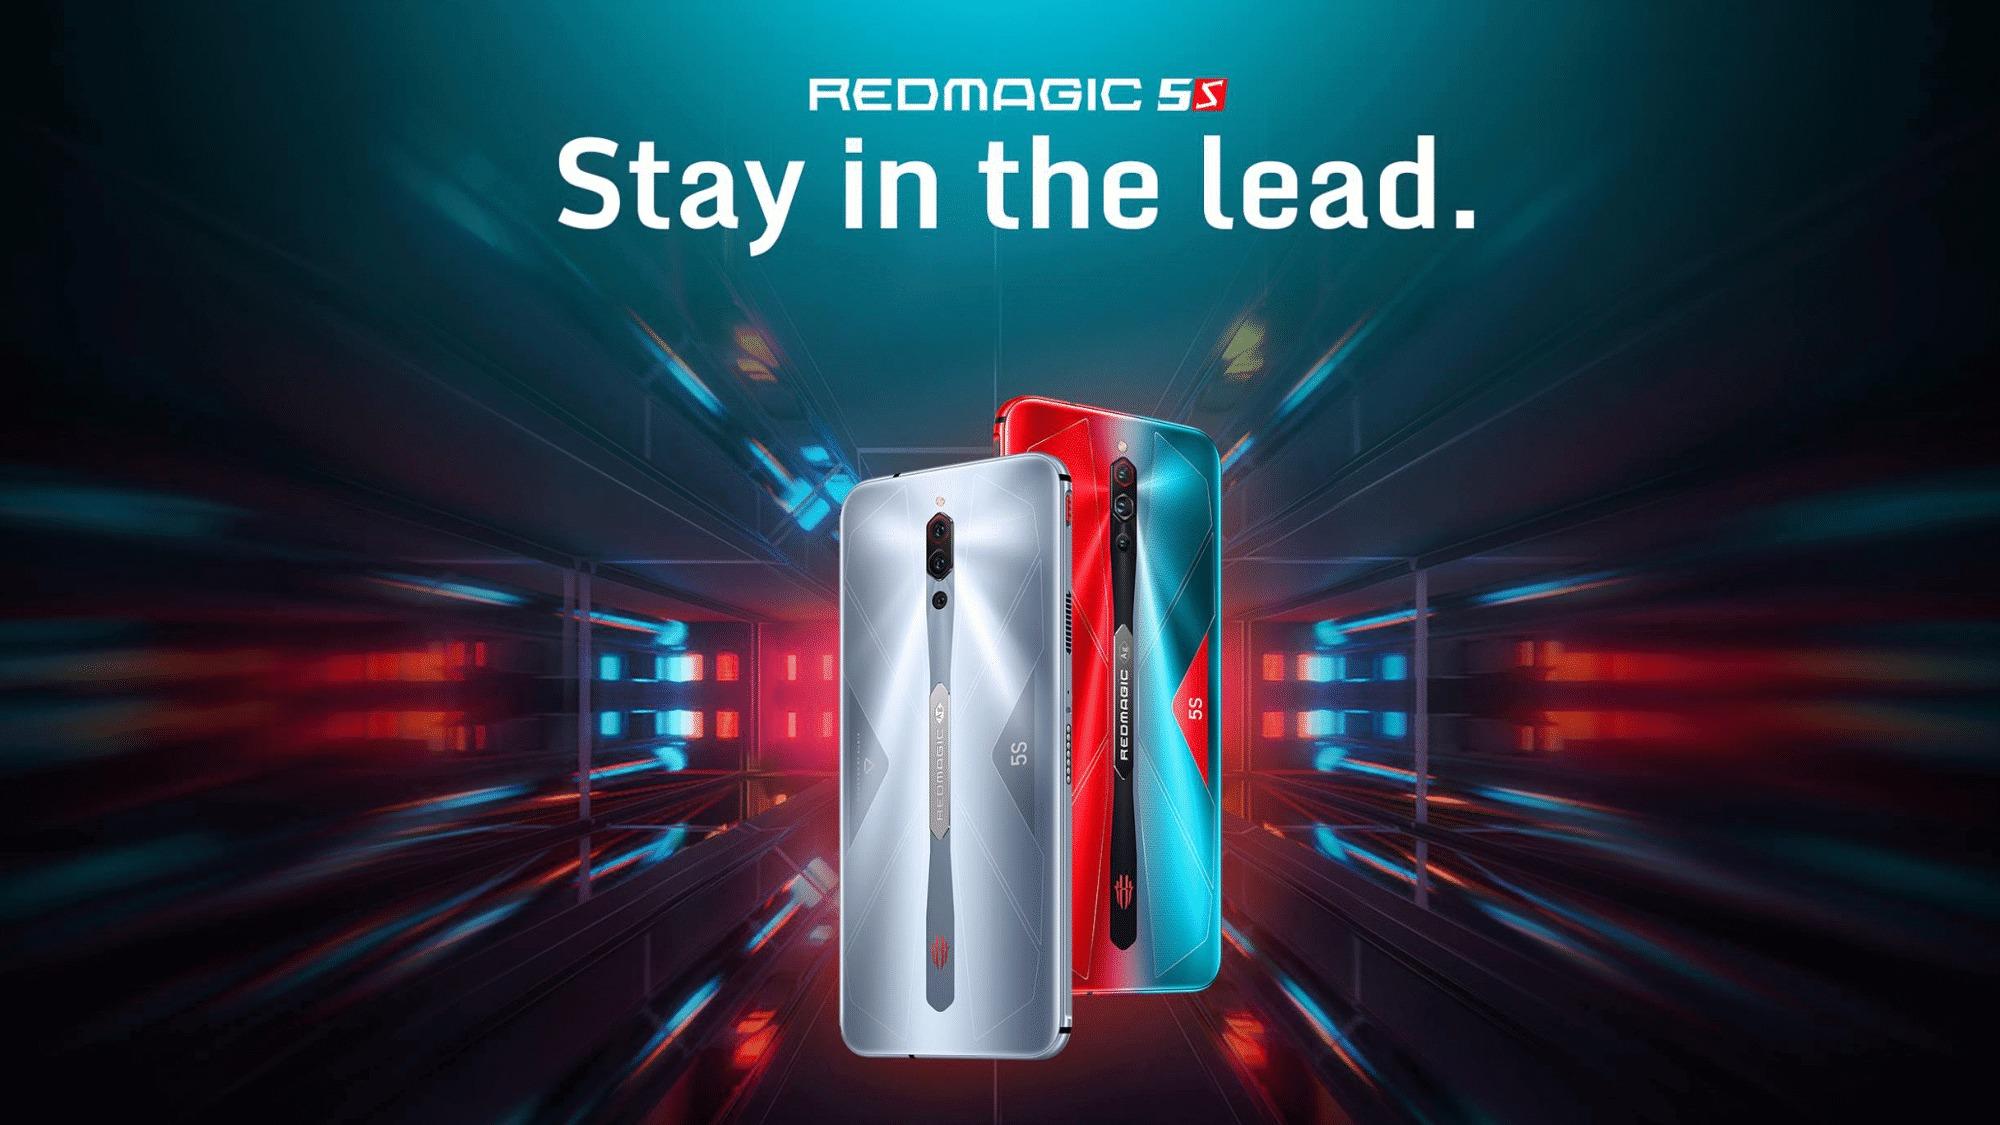 Nubiaの5Gゲーミングスマホ「RedMagic 5S」が日本向けに発売。価格は約6.1万円から【PR】